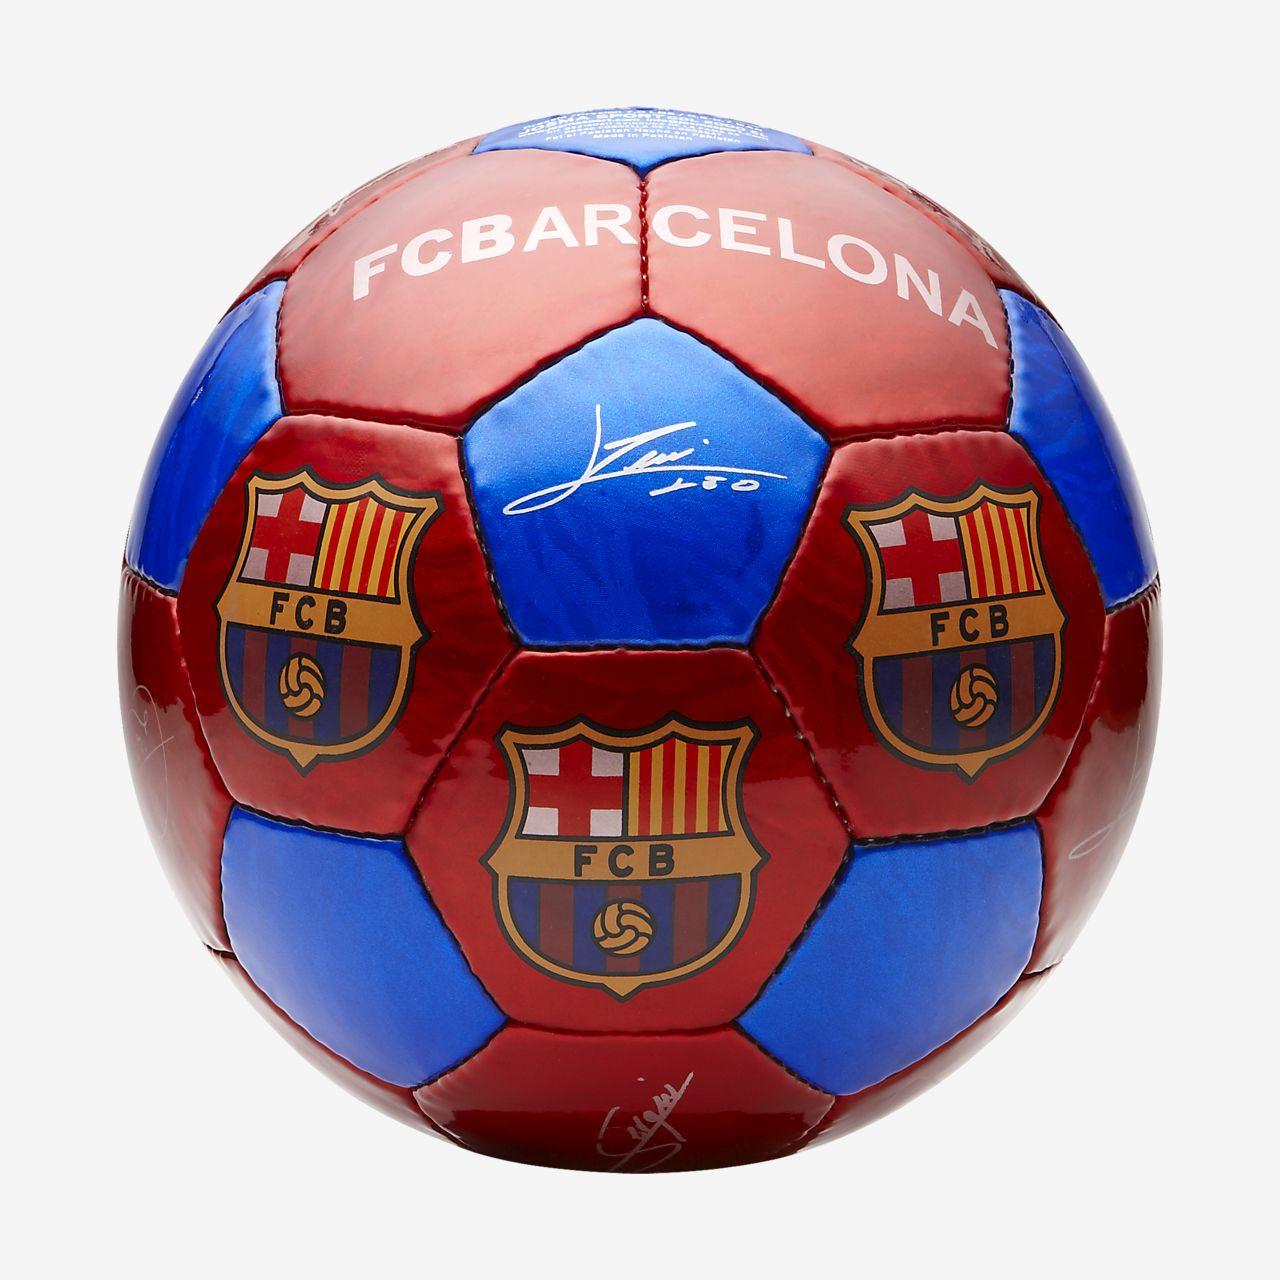 FC Barcelona Fußball (Größe L)